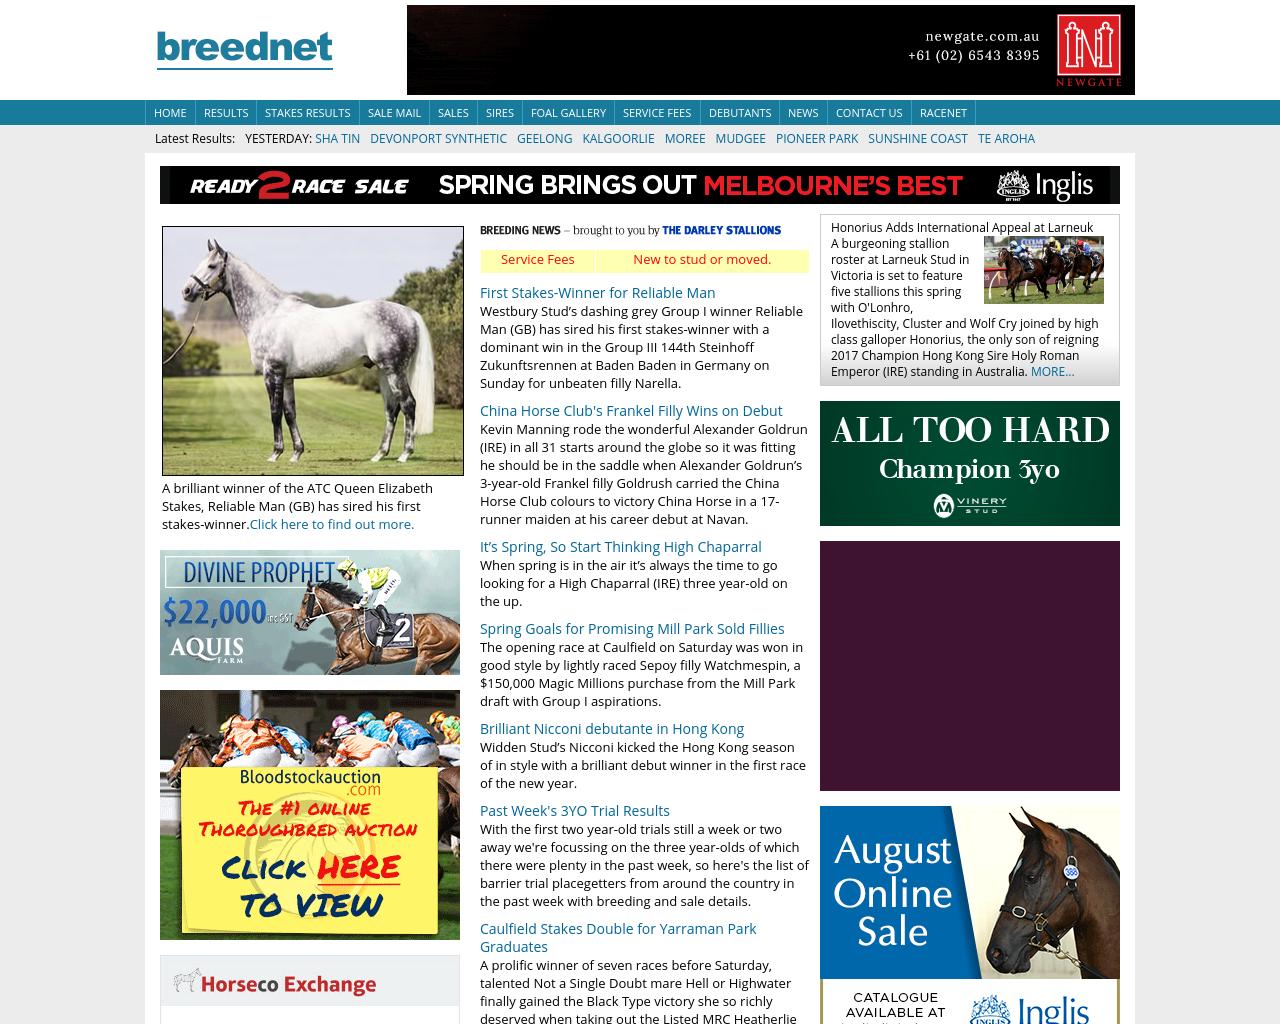 Breednet-Advertising-Reviews-Pricing